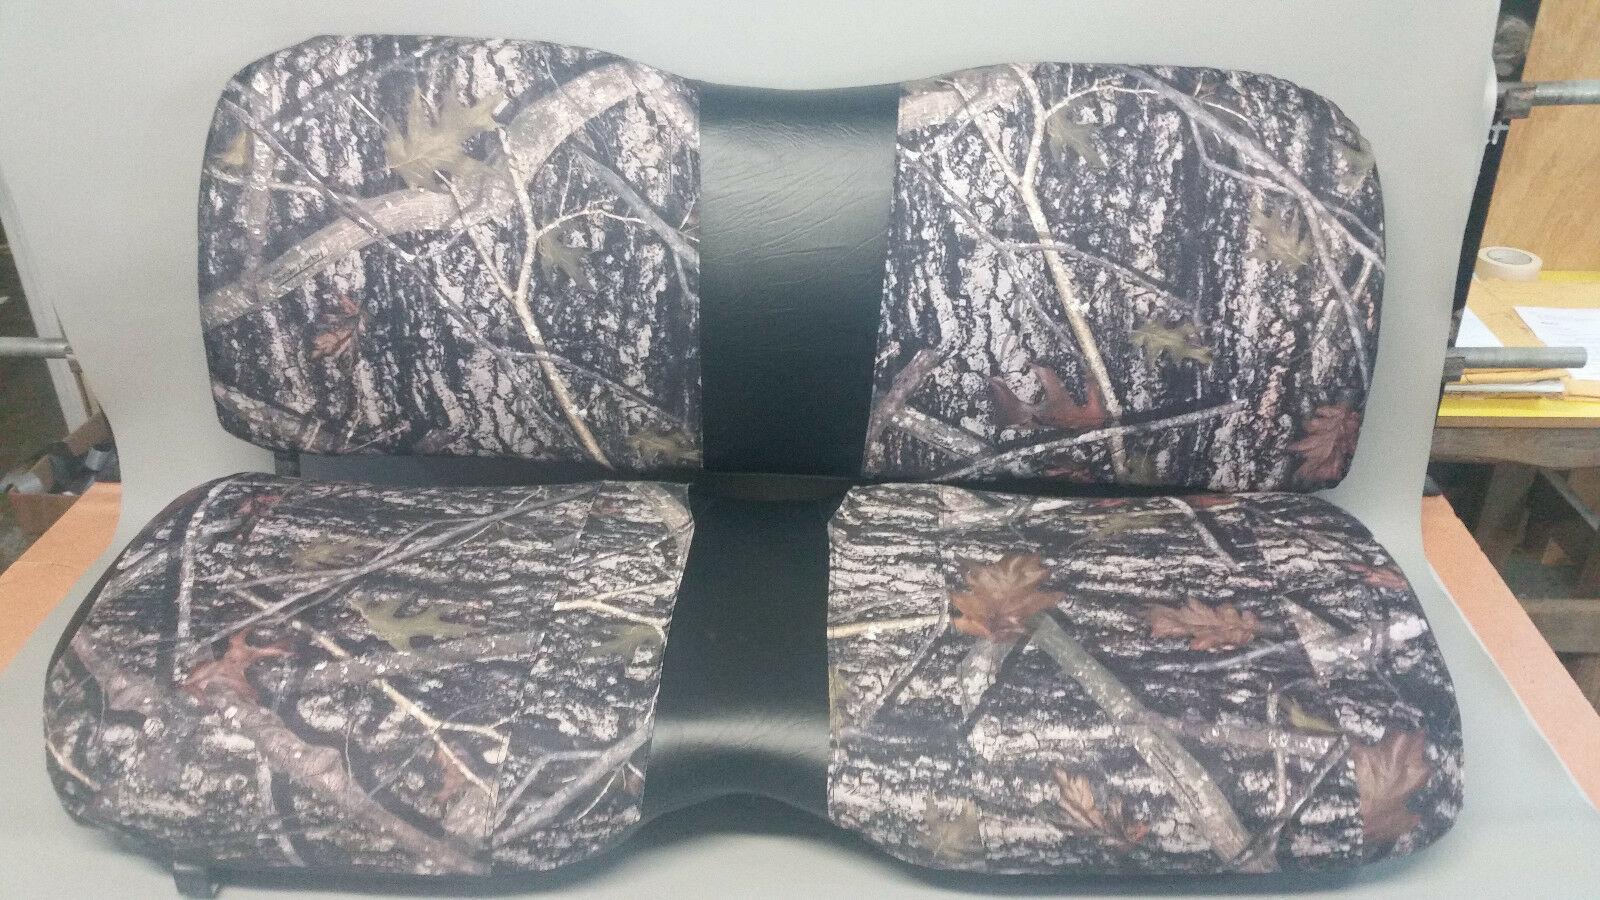 John Deere Gator Bench Seat Covers Xuv 855d In Bare Timber